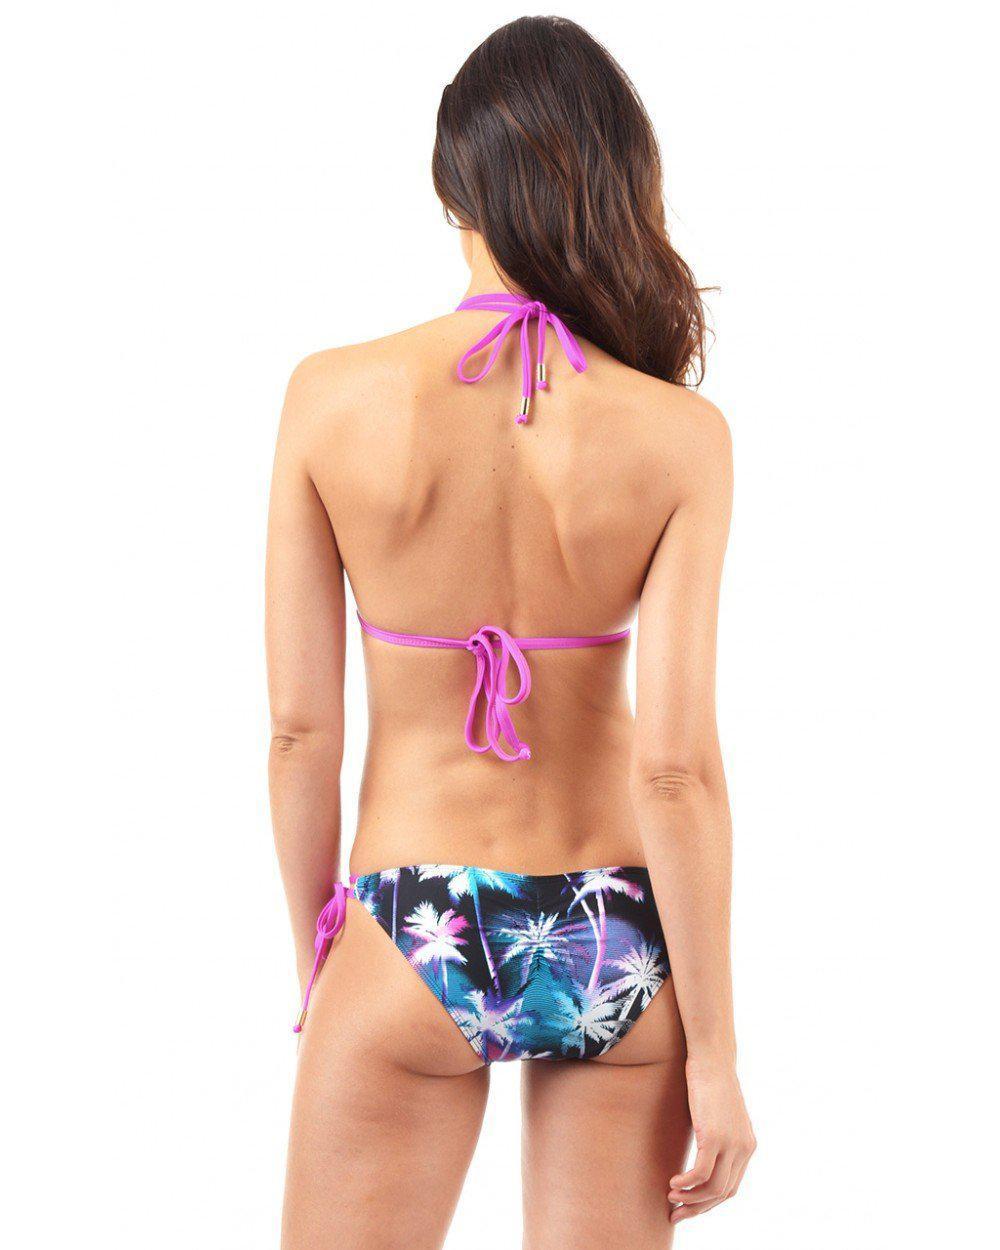 4212b708fc Lyst - Voda Swim Miami Envy Push Up Double String Bikini Top - Save 32%